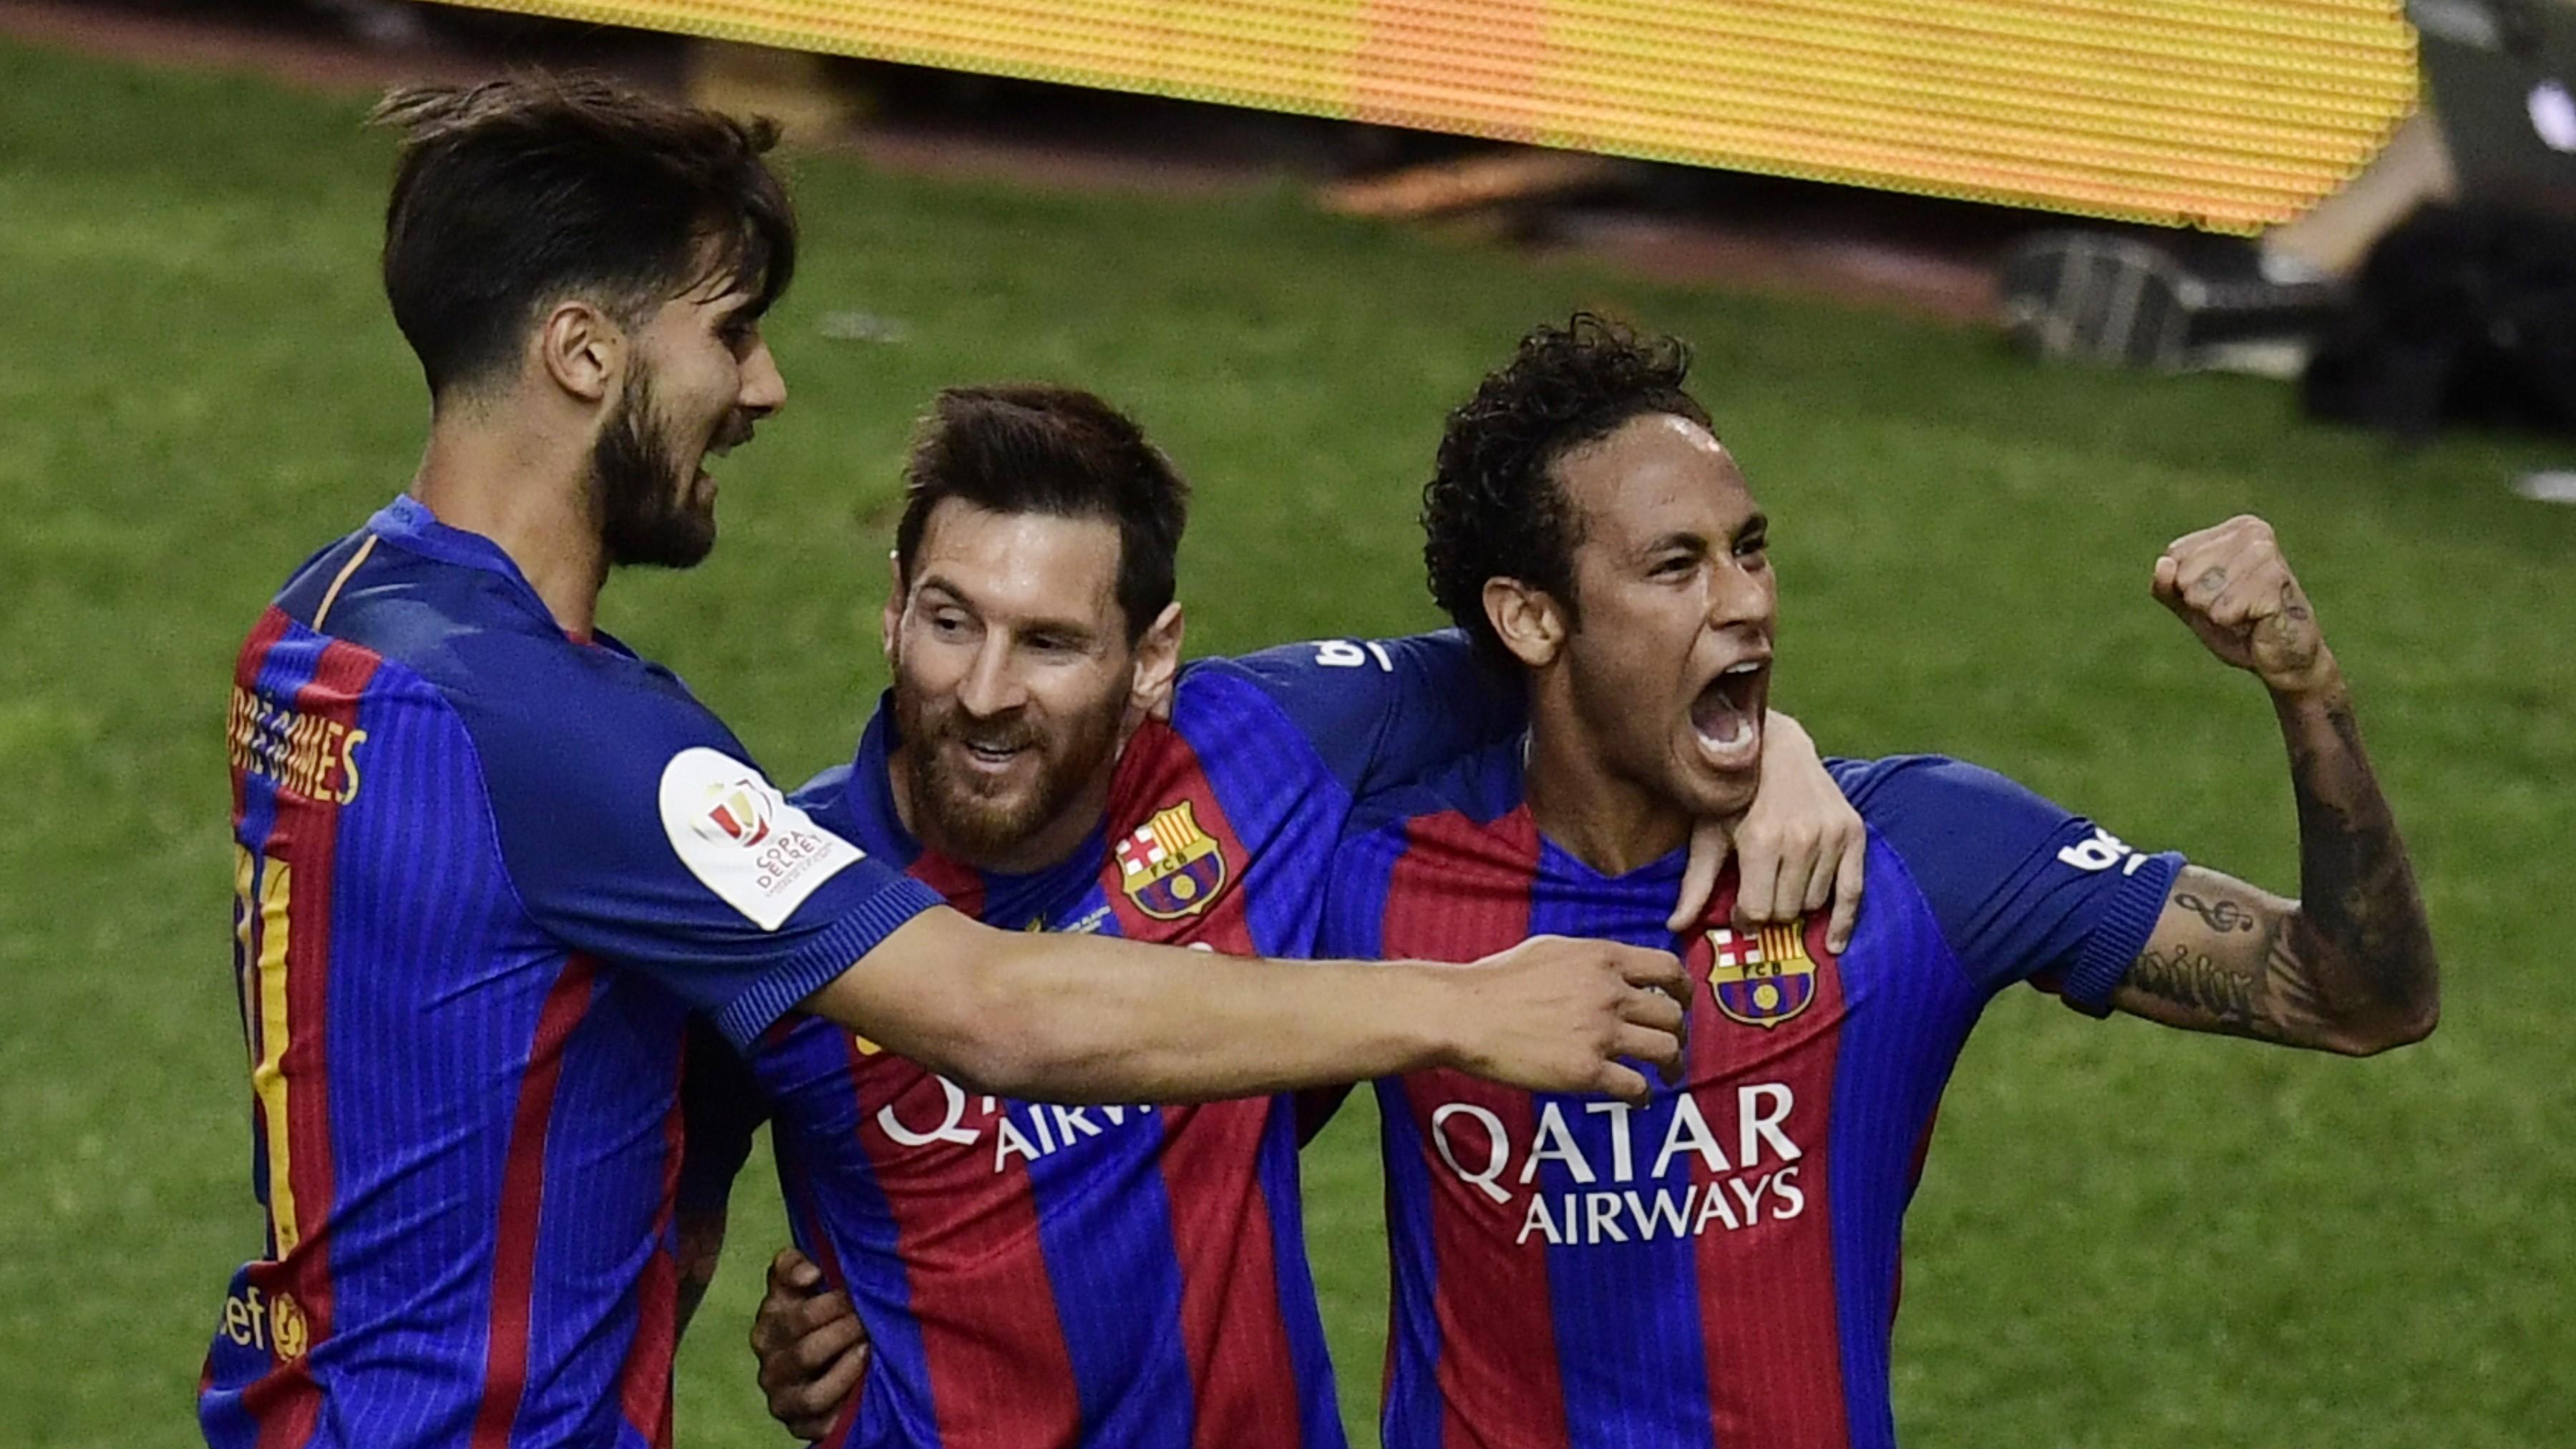 Lionel Messi Neymar Andre Gomes Barcelona Alaves Copa del Rey 27052017